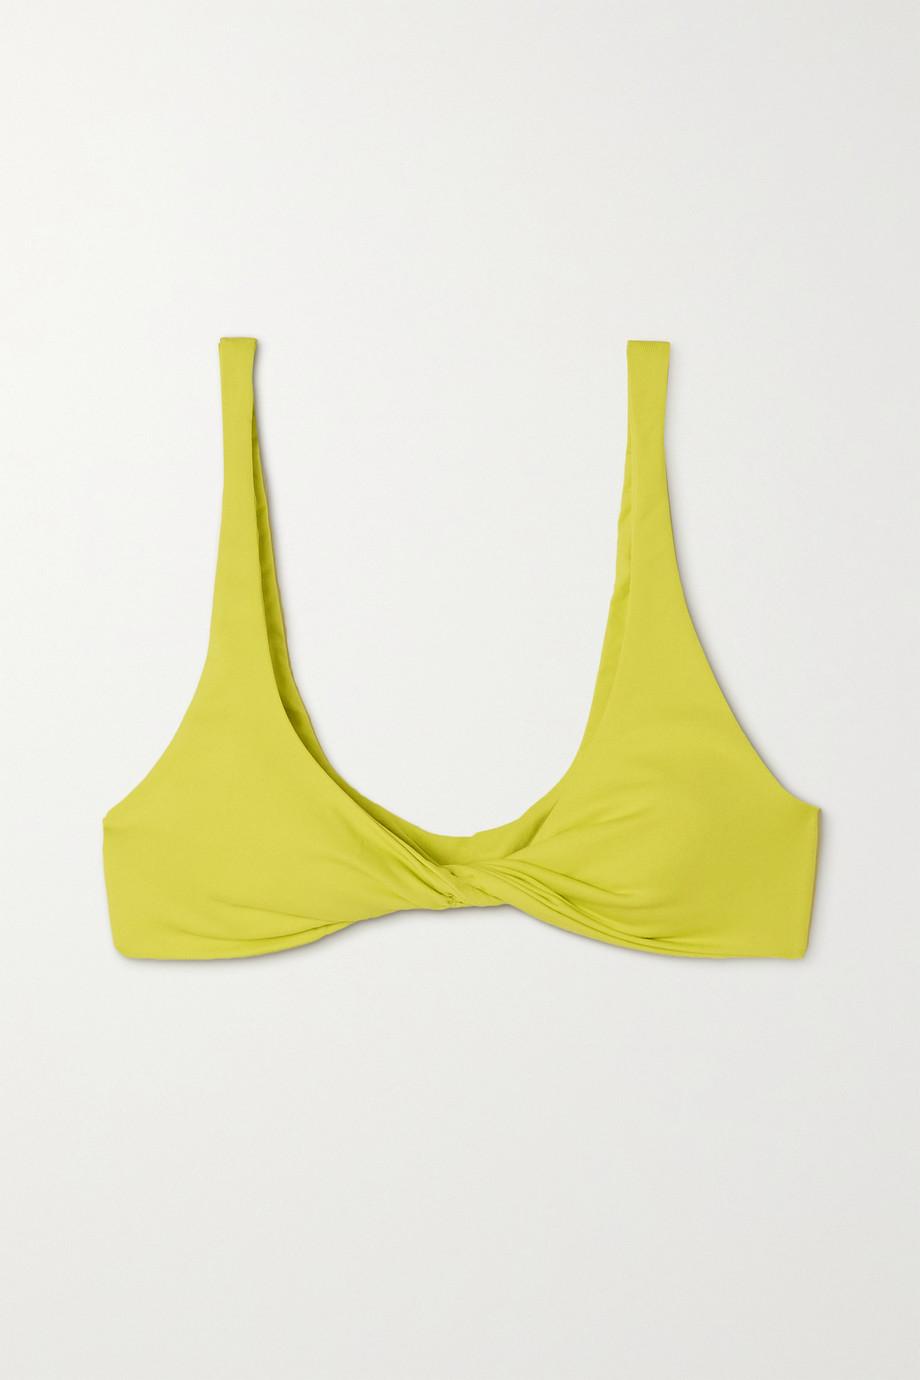 The Attico Twisted ribbed triangle bikini top